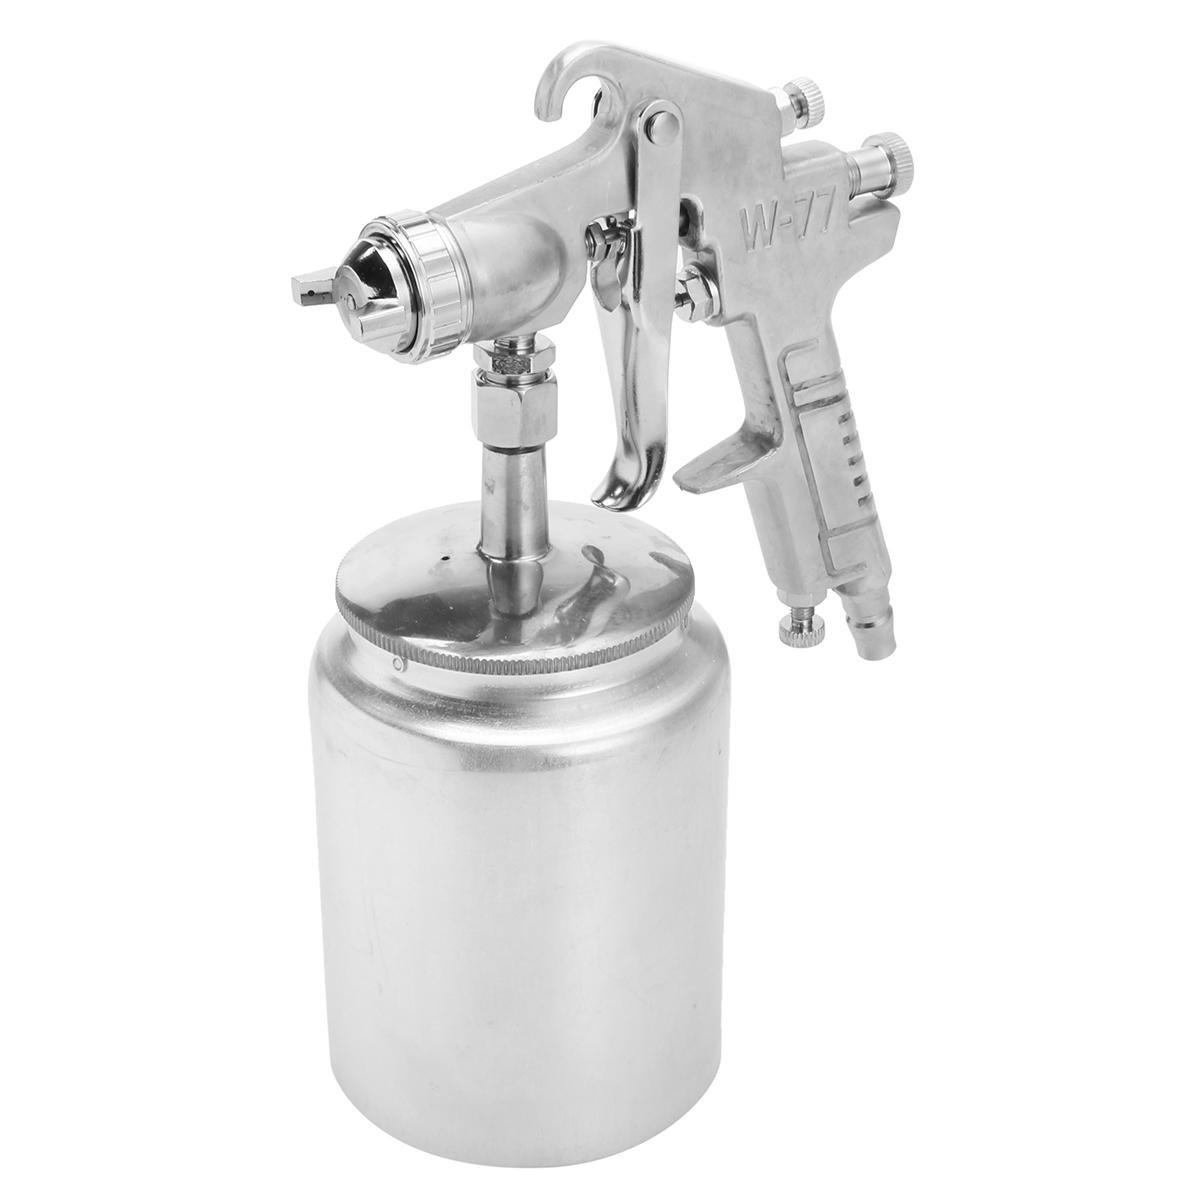 Heavy Duty Paint Suction Feed Spray Gun 3mm Large Nozzle 1L Pot Set-Up Sprayer